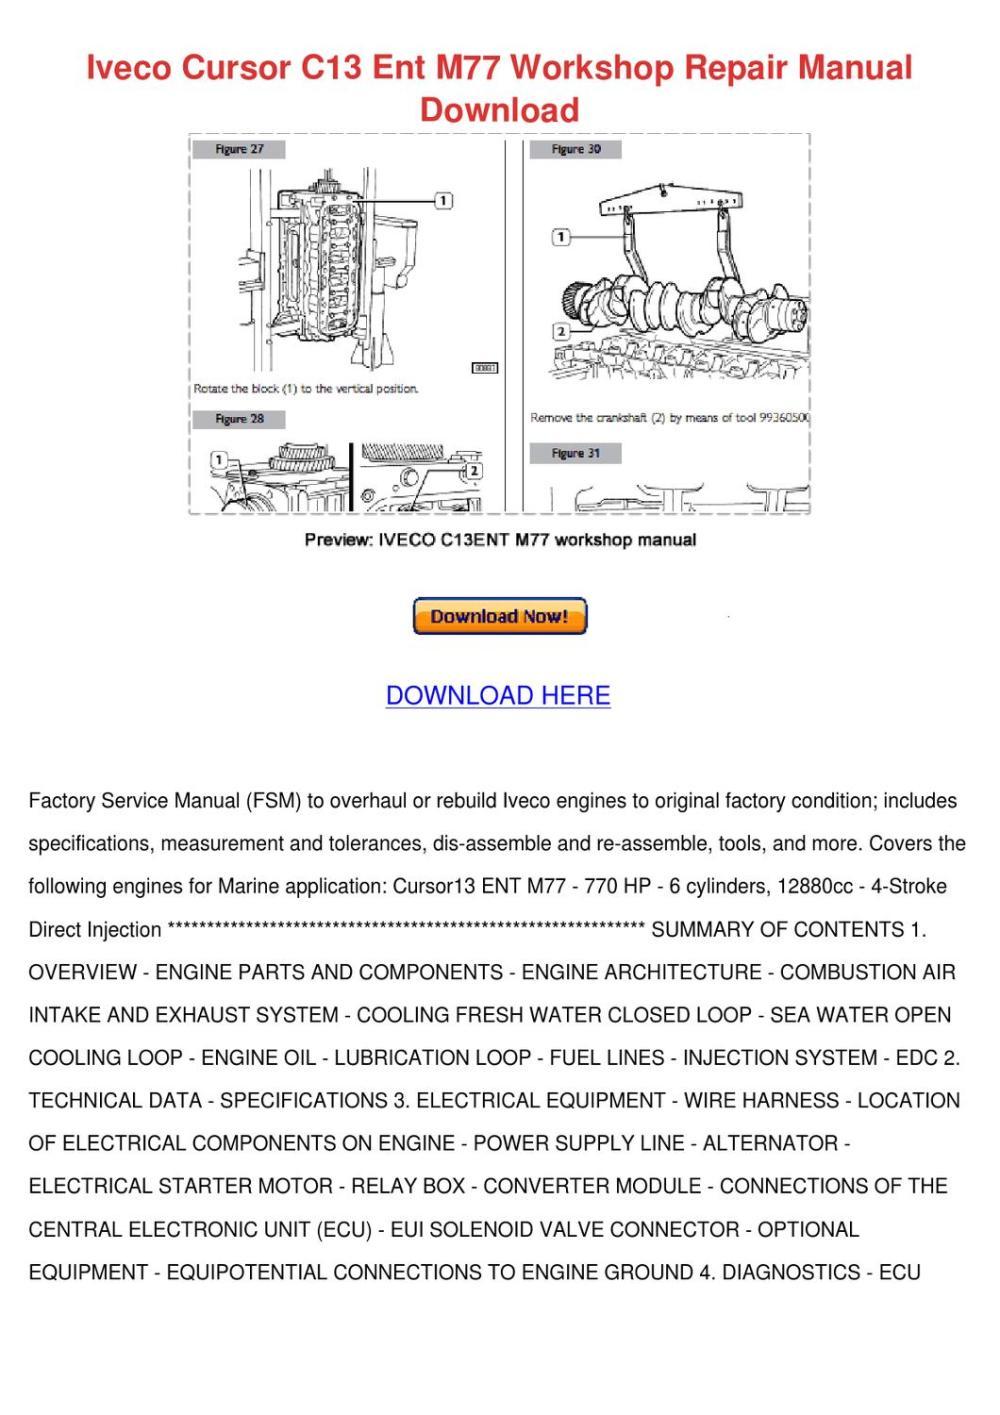 medium resolution of iveco cursor c13 ent m77 workshop repair manu by darci lovering issuu 2001 arctic cat 400 wiring diagram